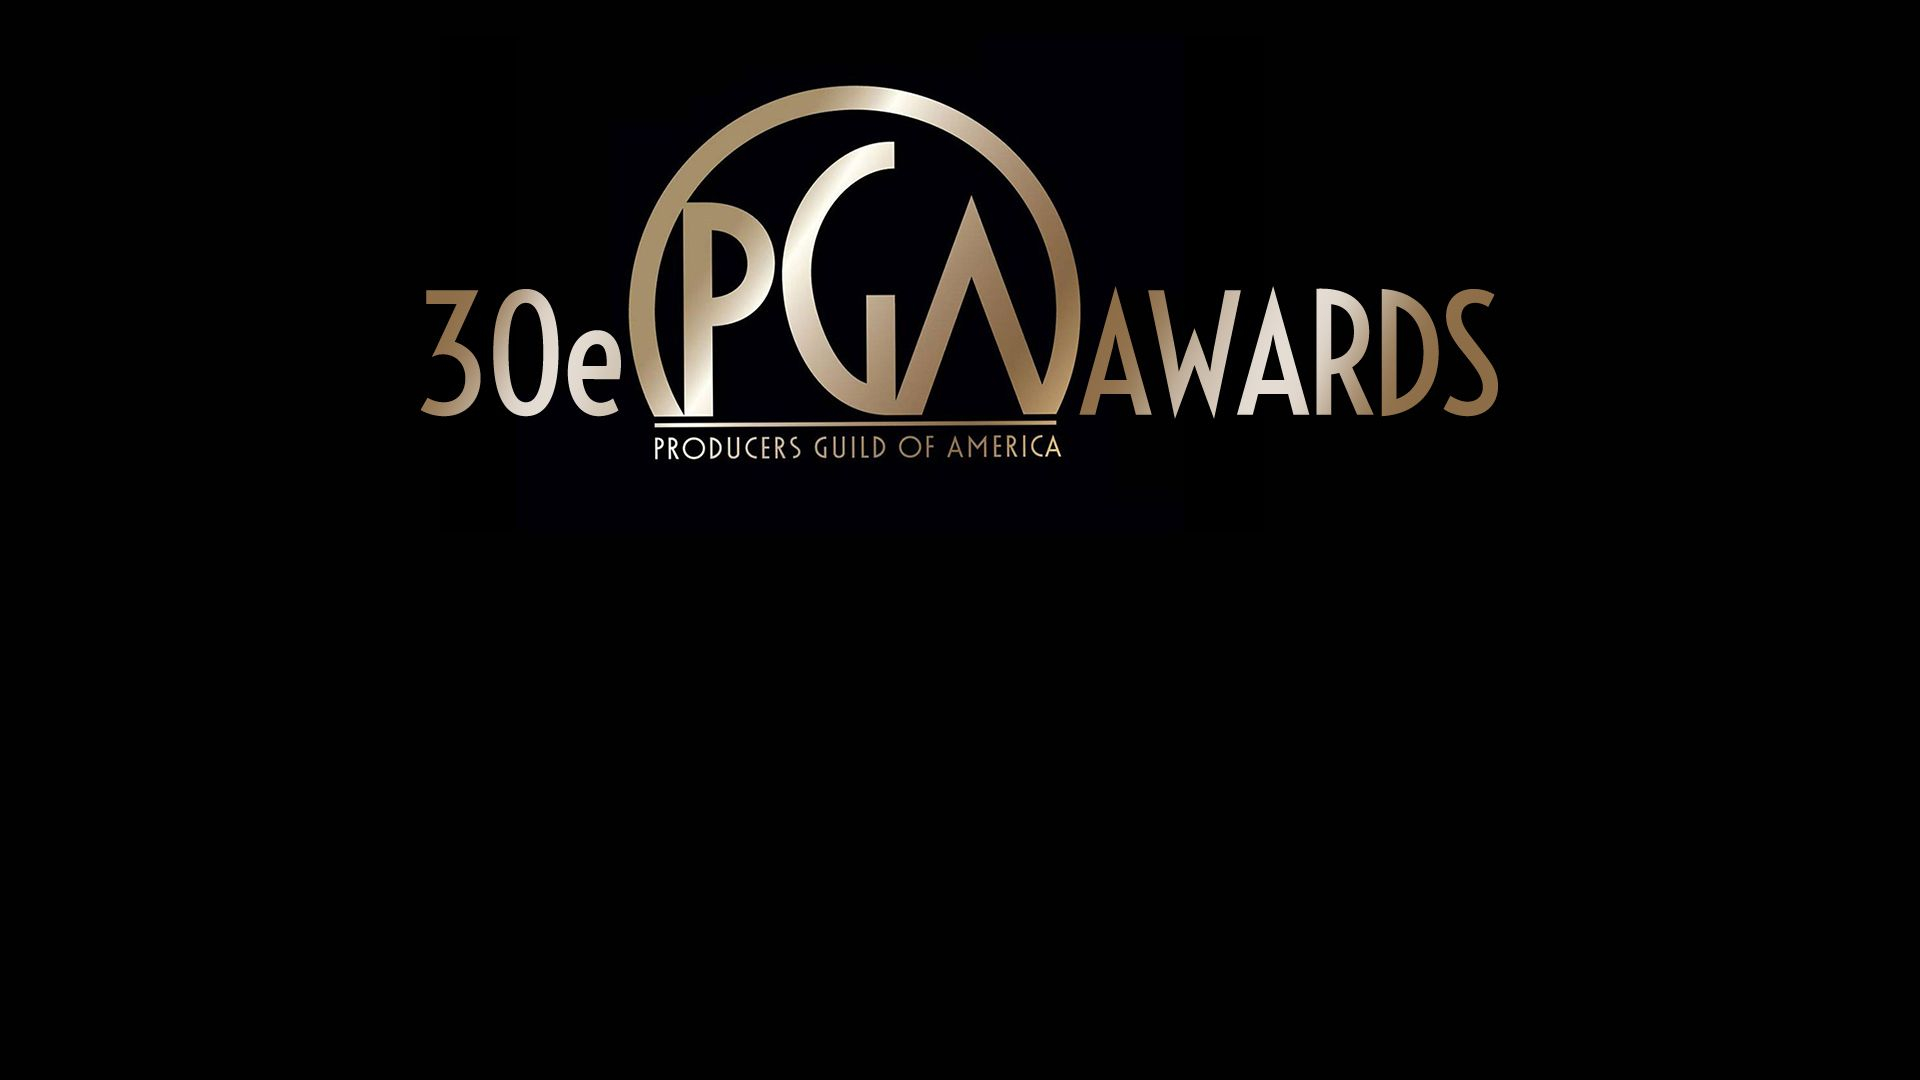 30e PGA Awards : révélation des nominations